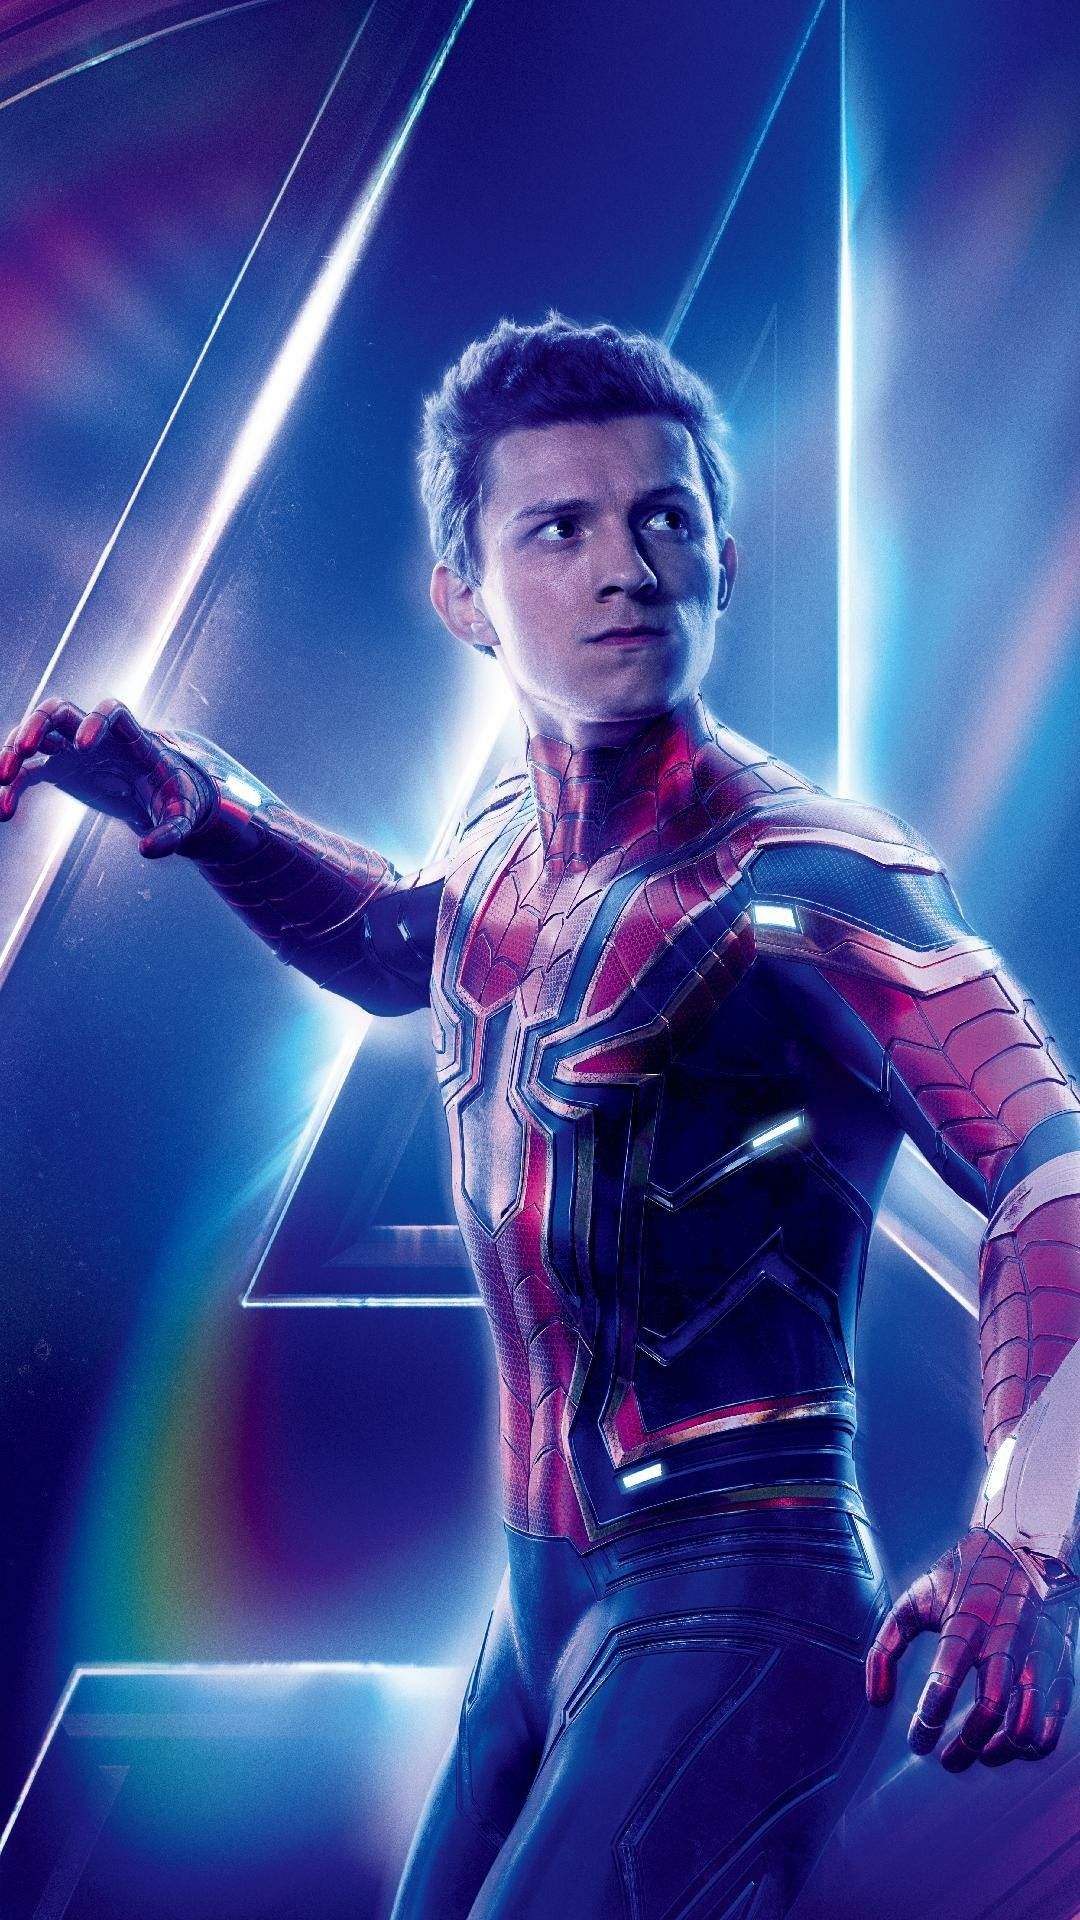 Wallpaper papel de parede 4k Spiderman infinity